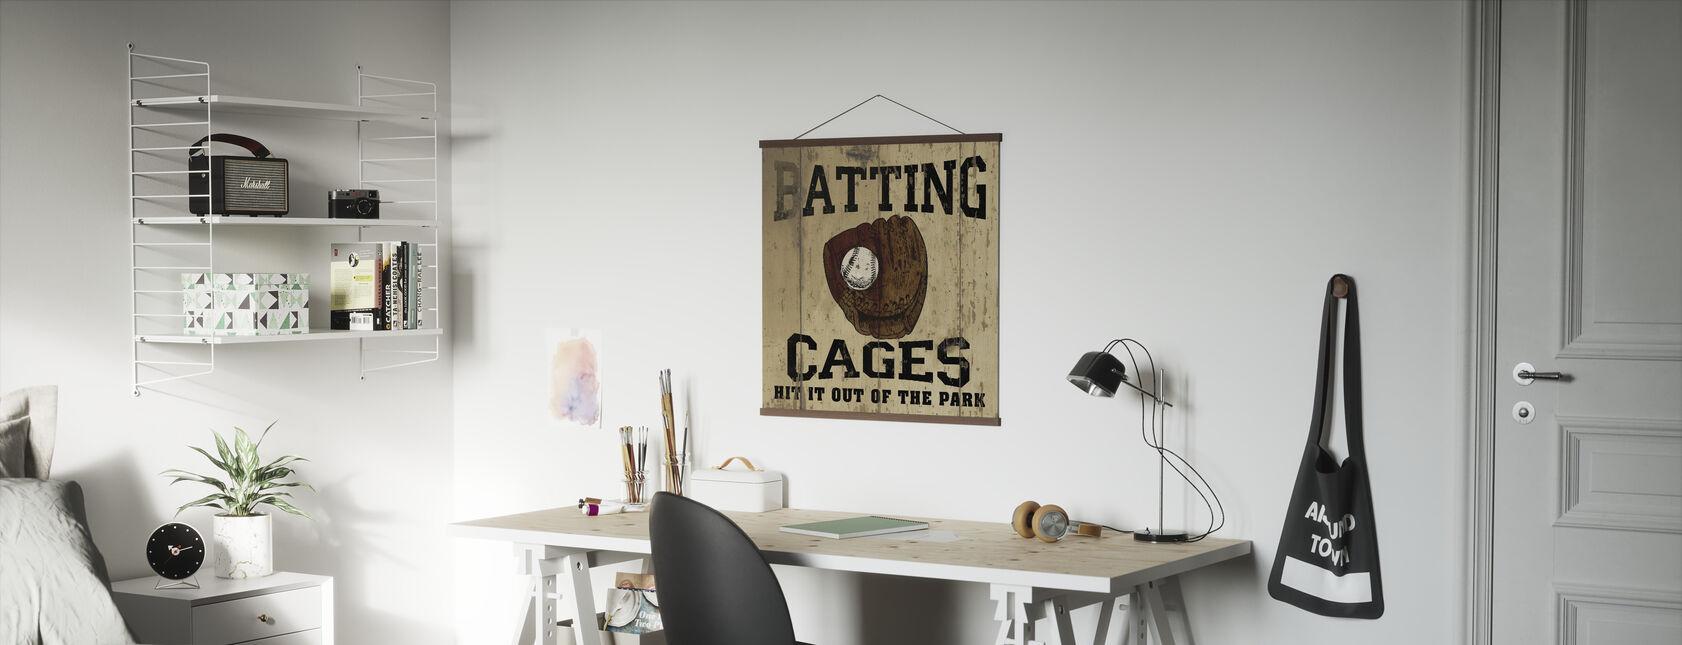 Batting bure - Plakat - Kontor